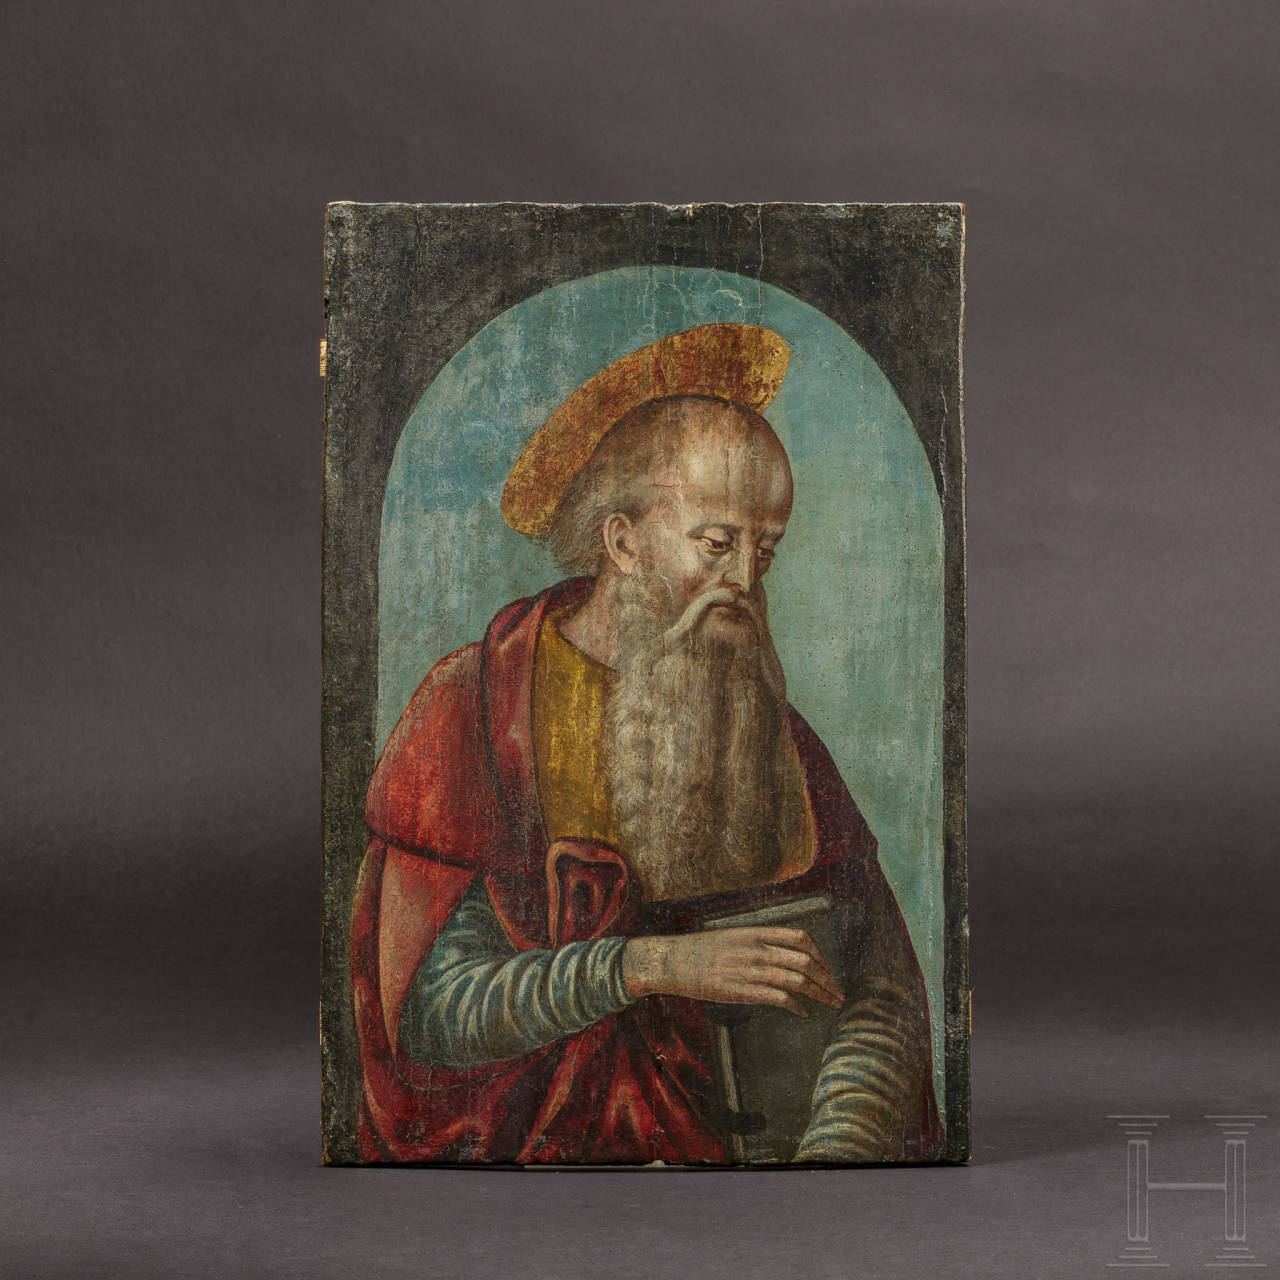 Hl. Anthonius von Padua, Italien, 1. Hälfte 15. Jhdt.